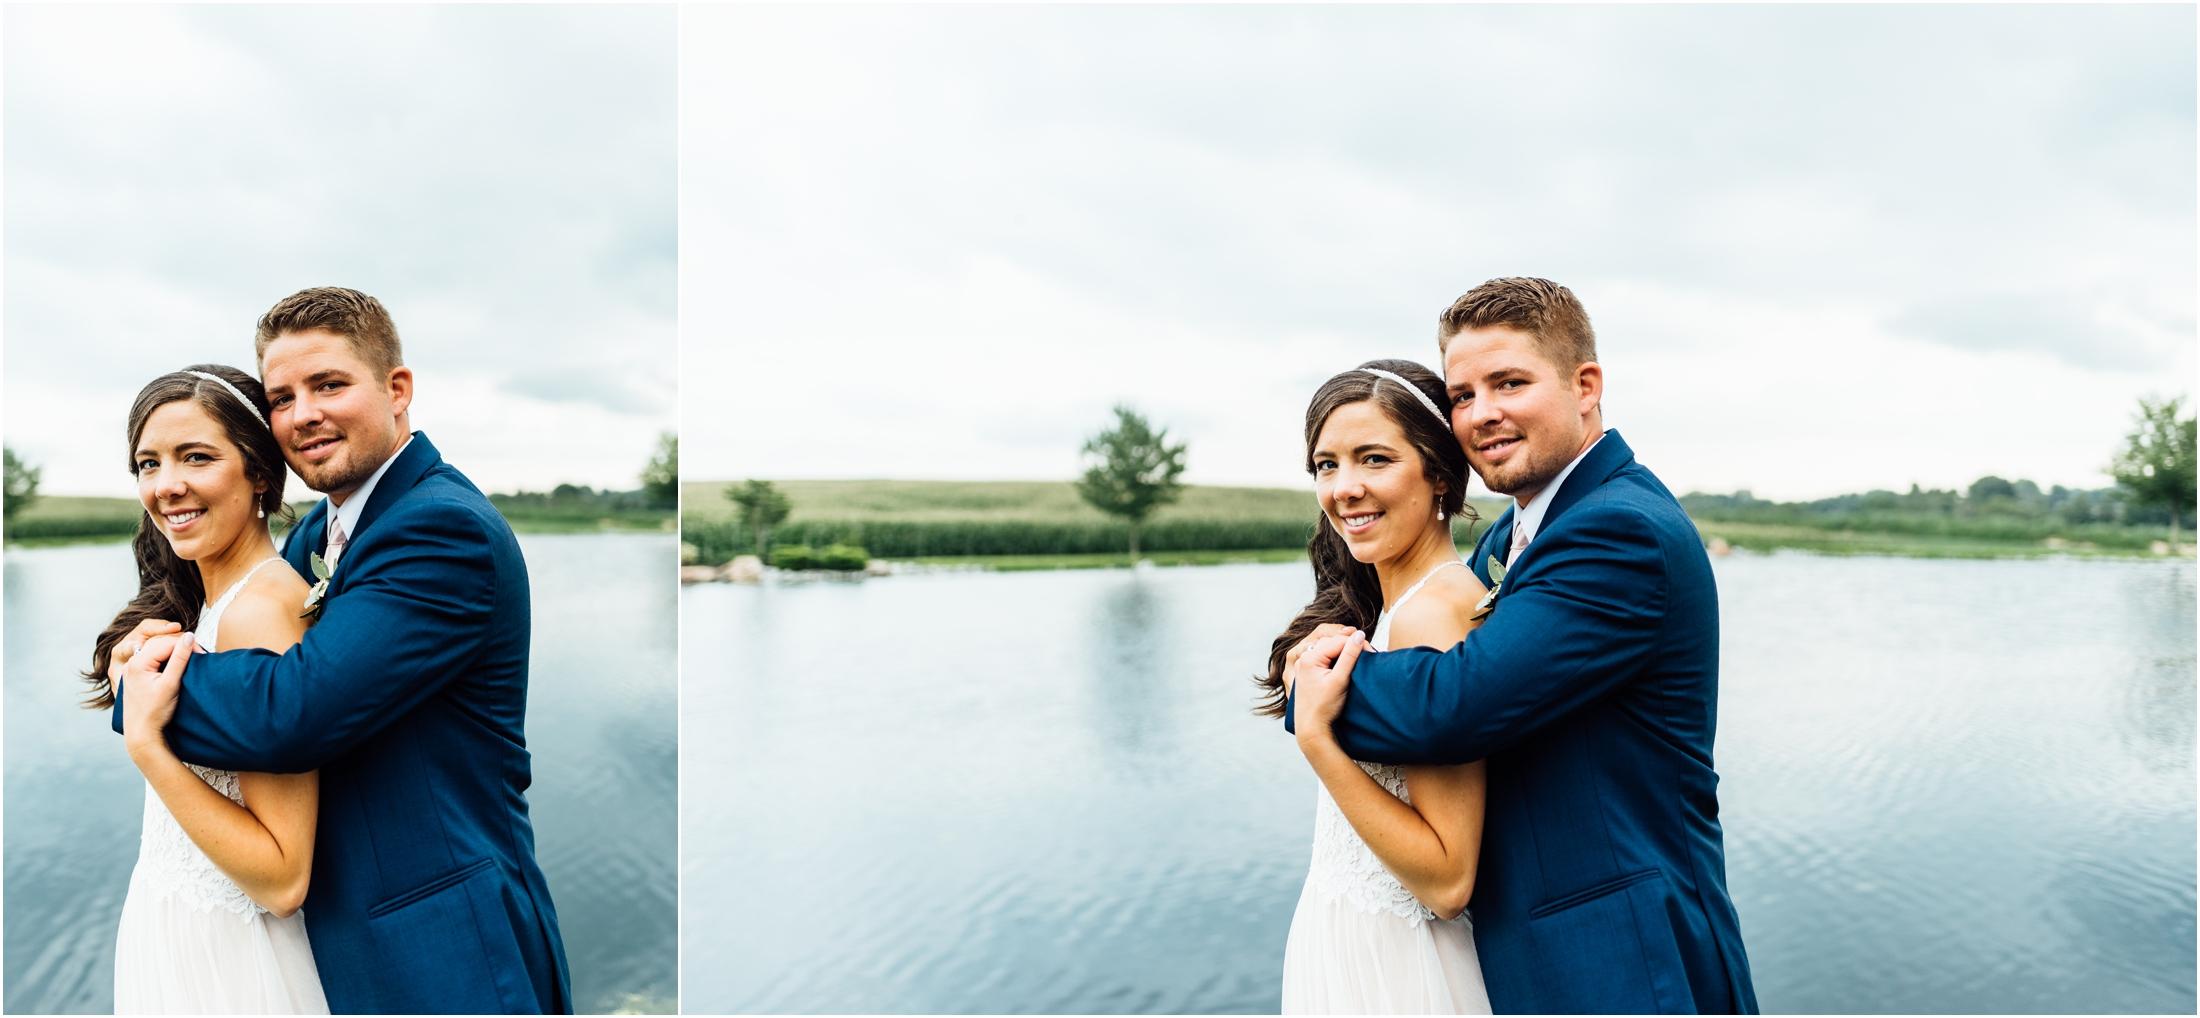 Steph&Bryan_Lancaster_wedding_farm_0549.jpg